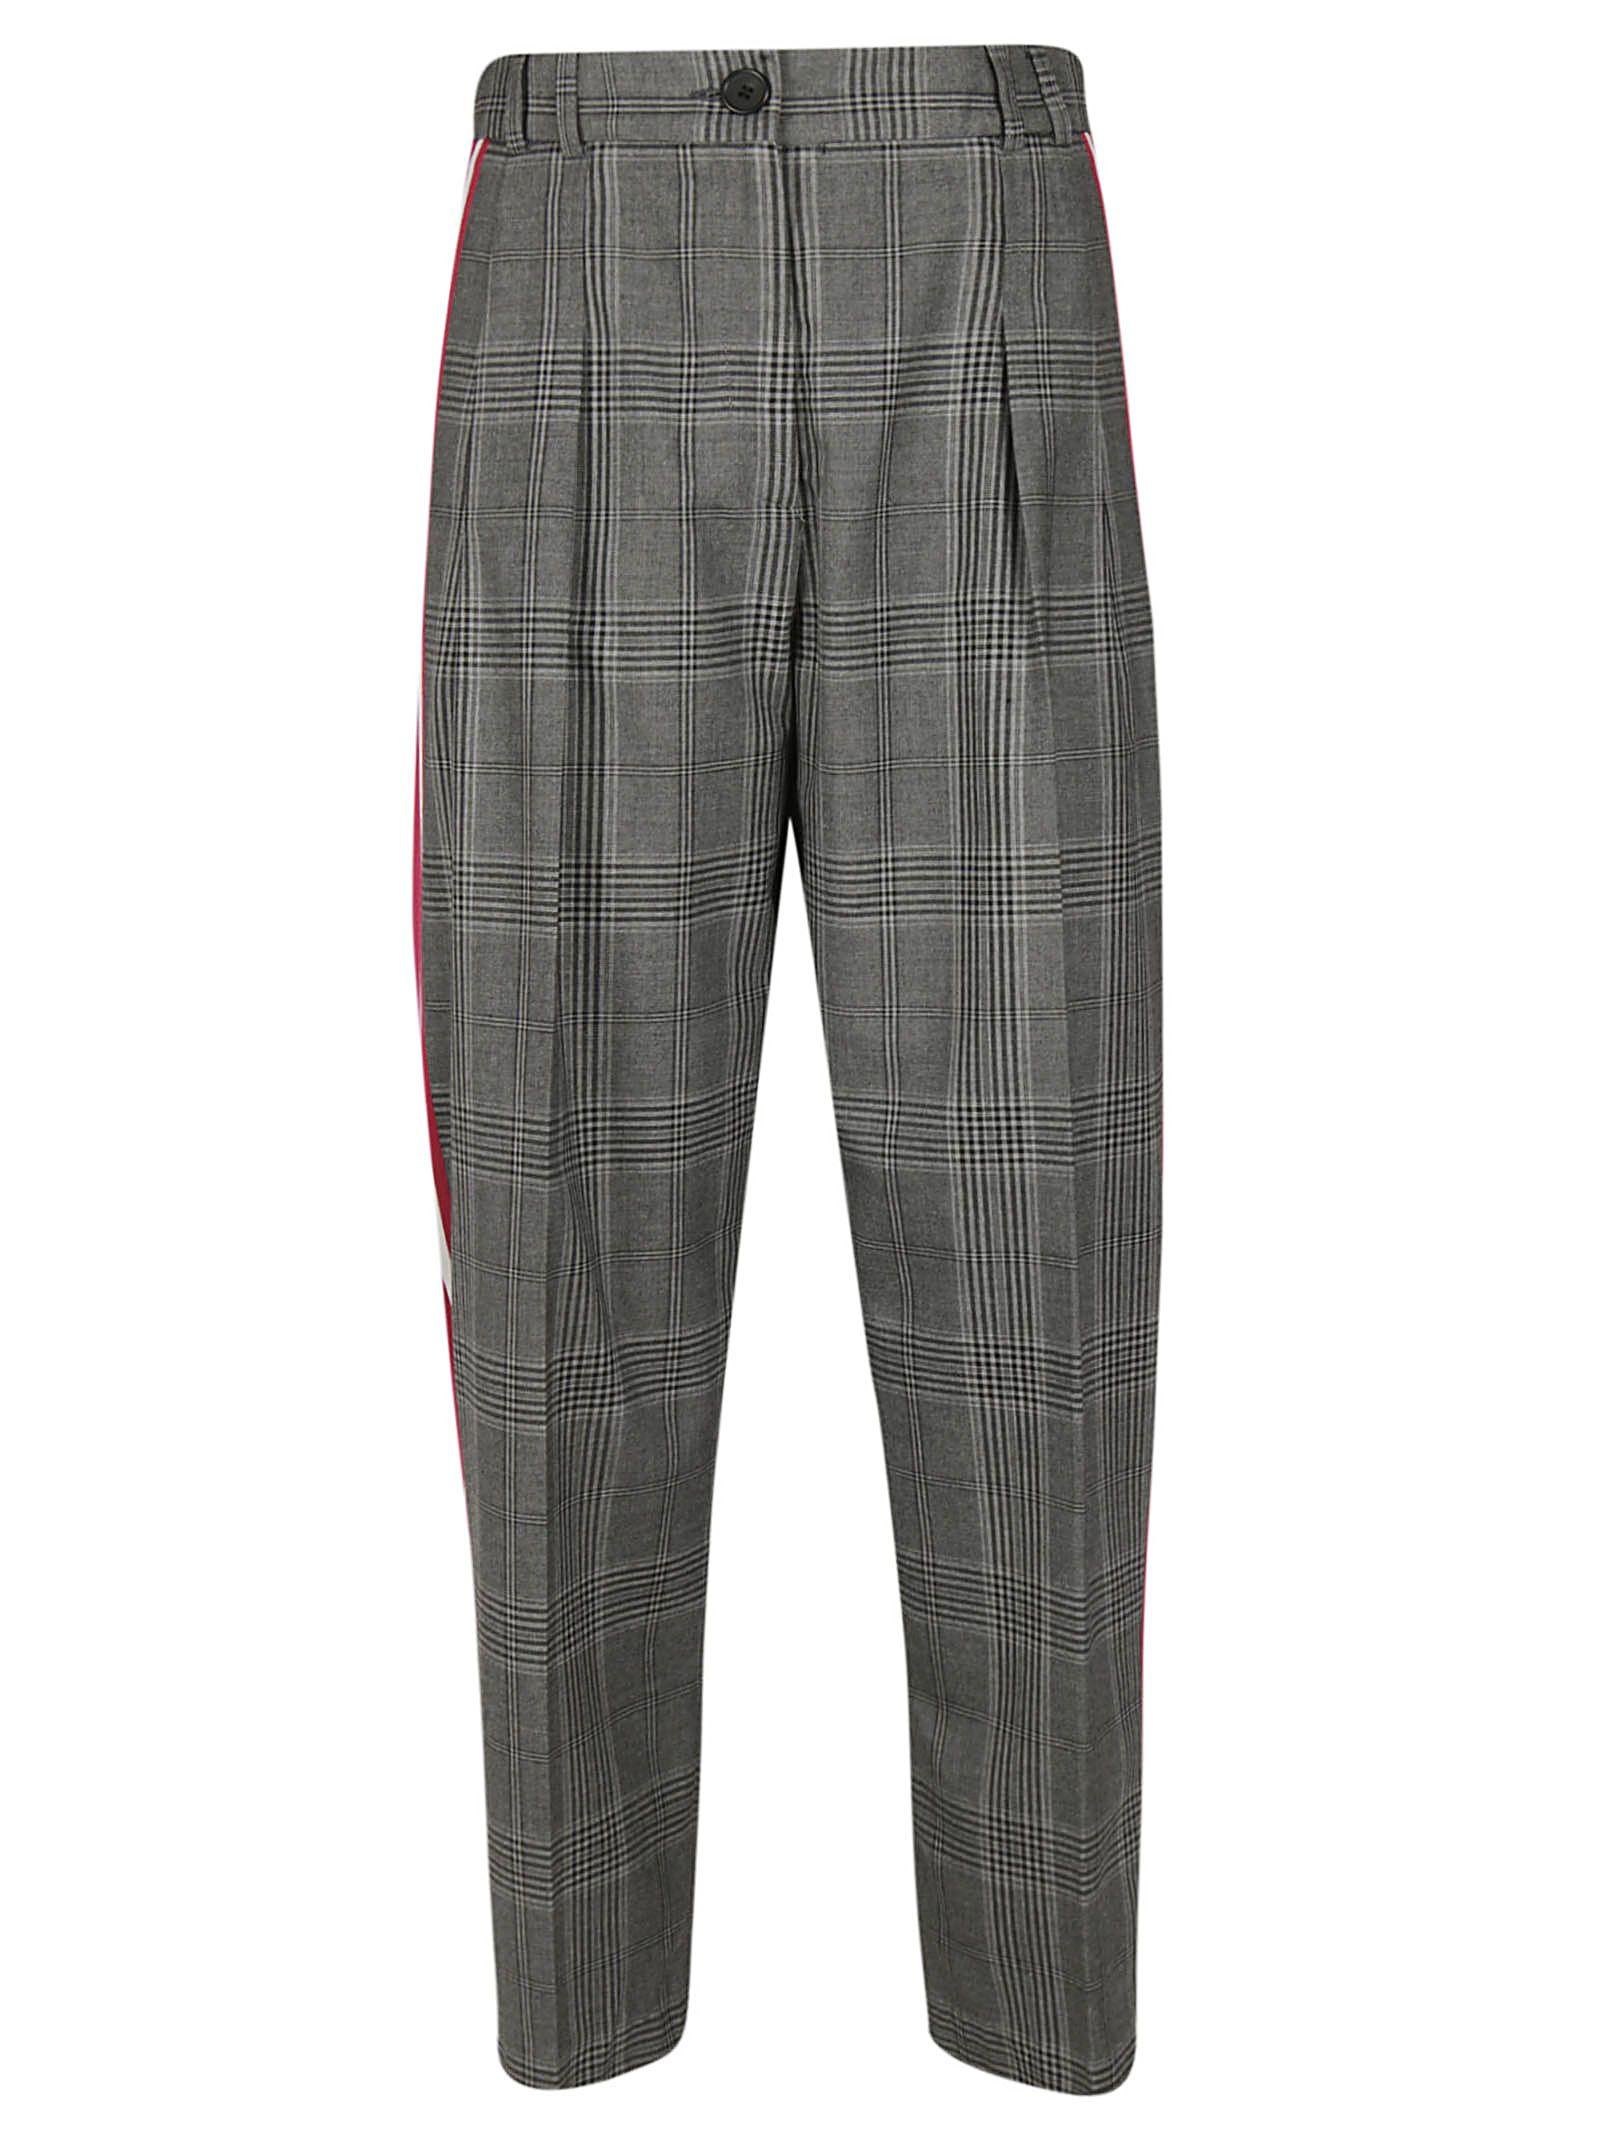 Tara Jarmon Patterned Trousers